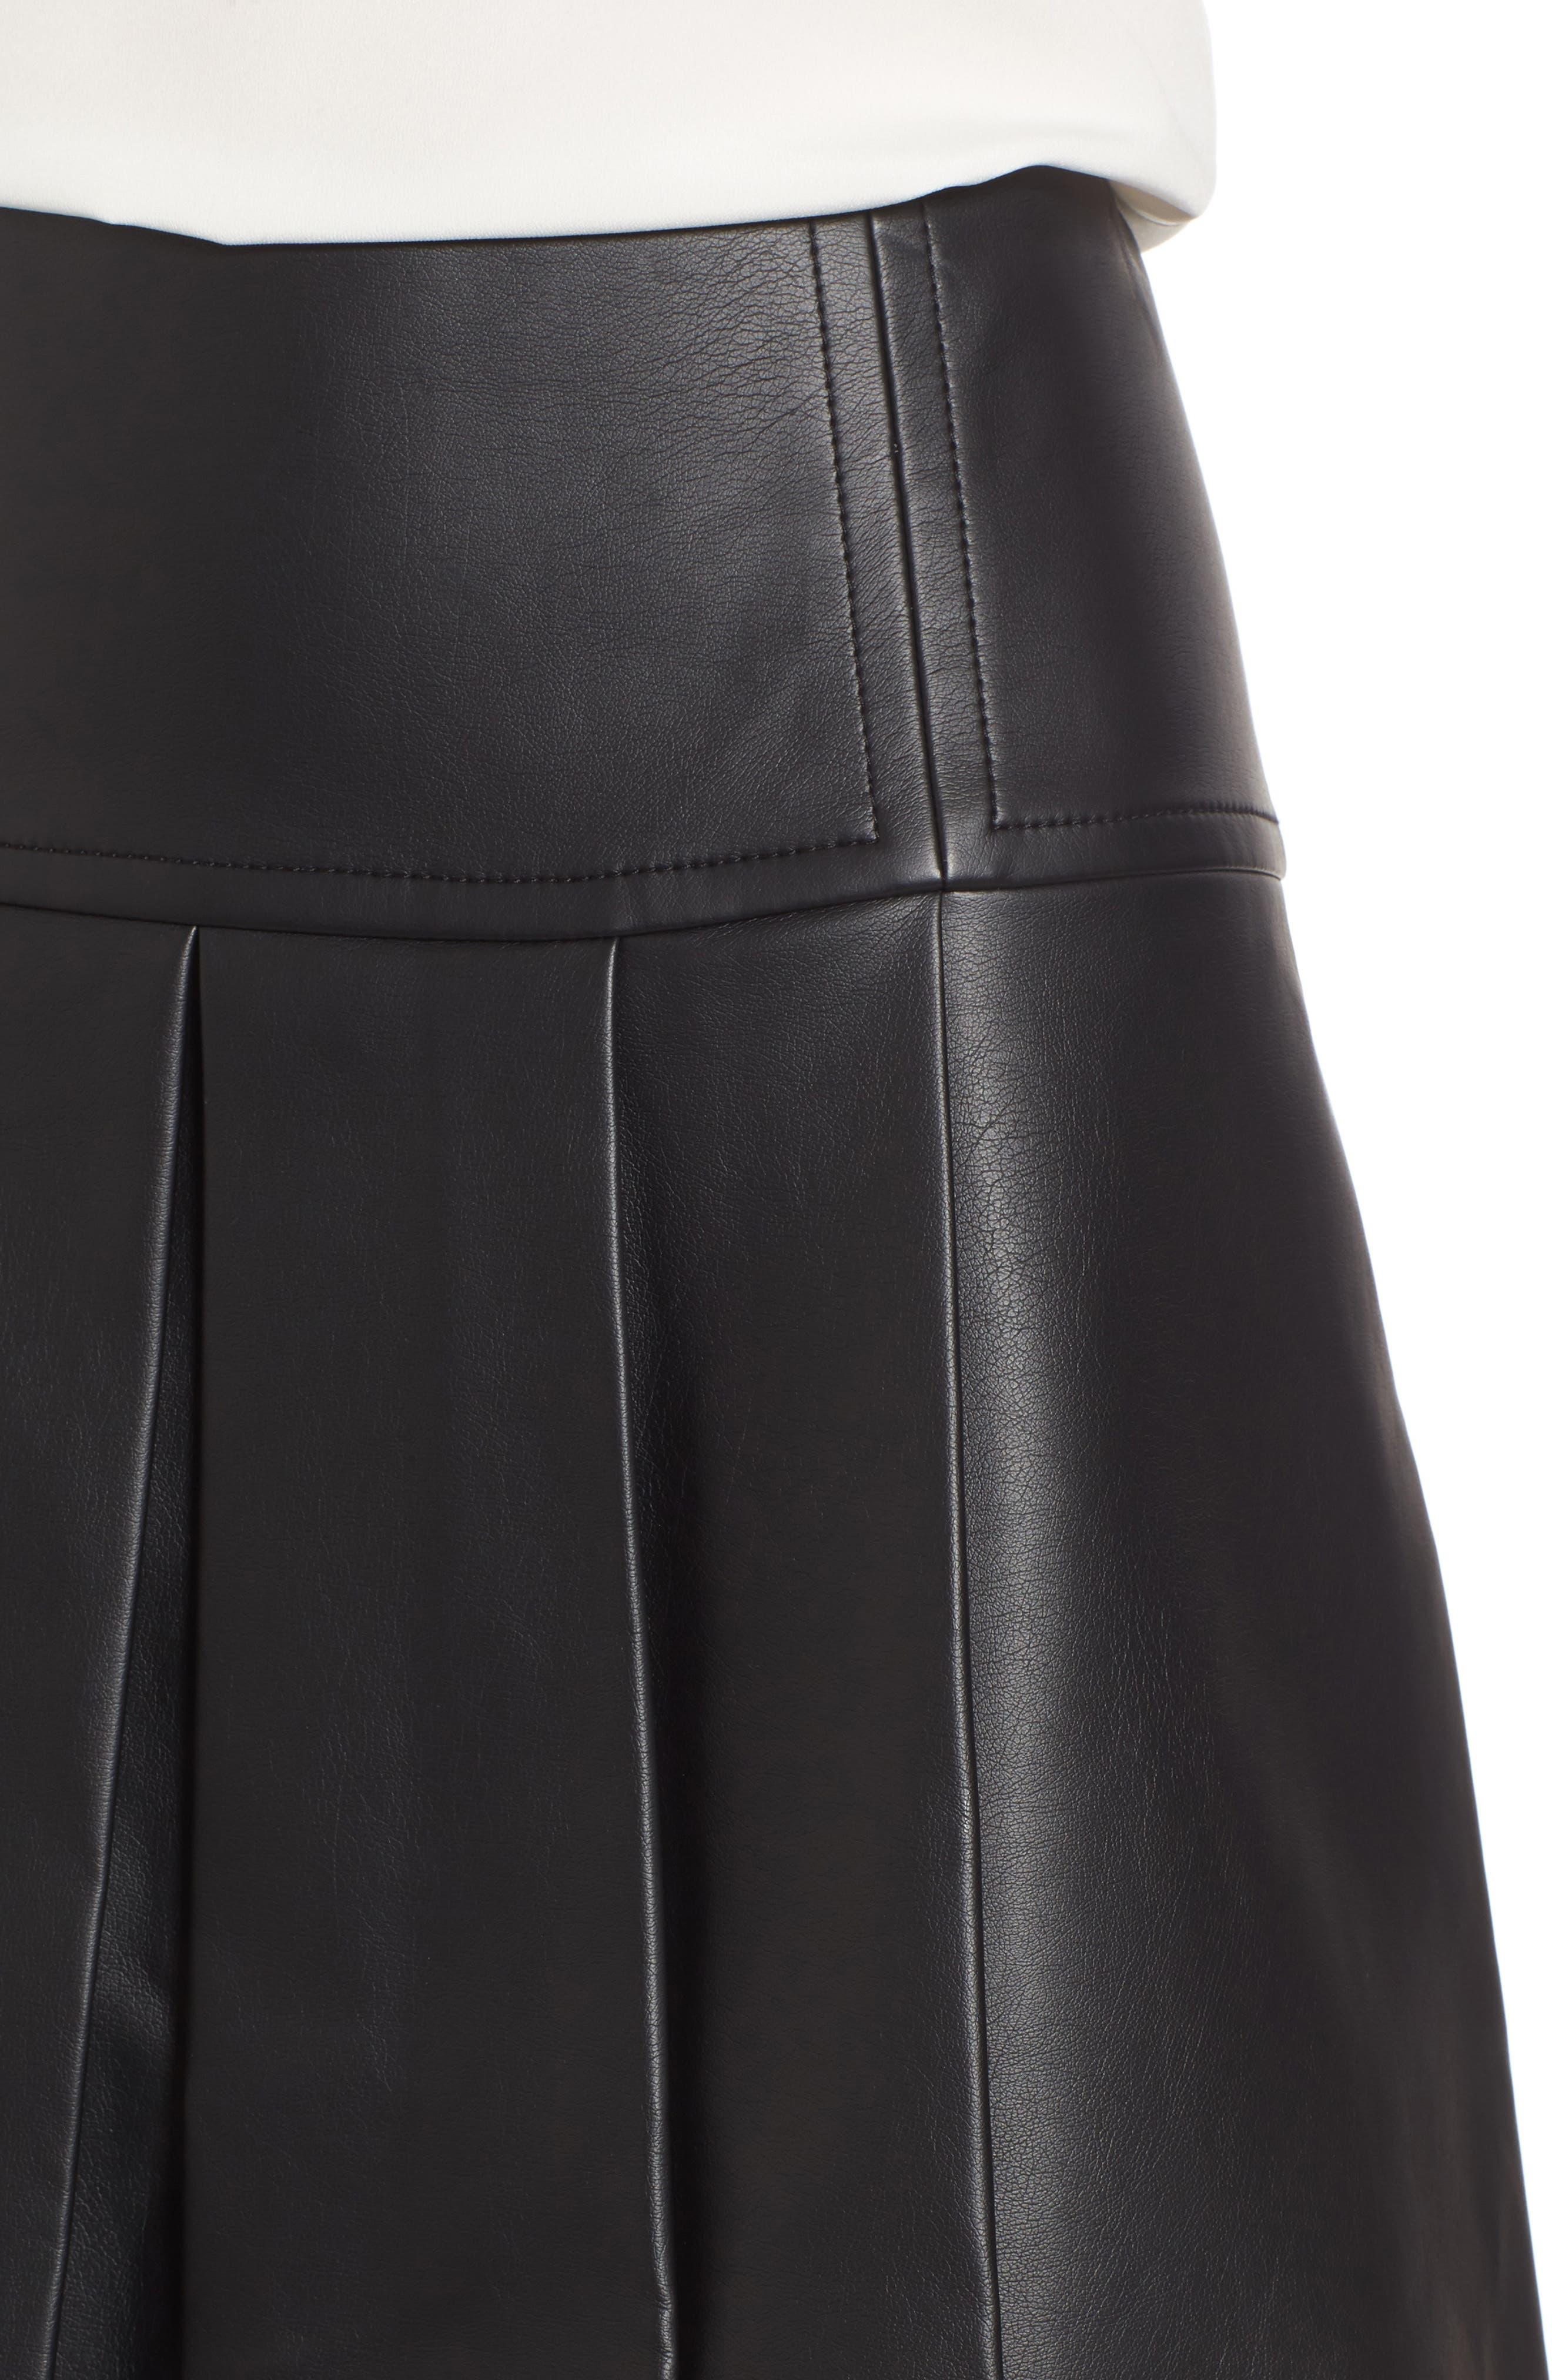 Pleat Faux Leather Skirt,                             Alternate thumbnail 4, color,                             001